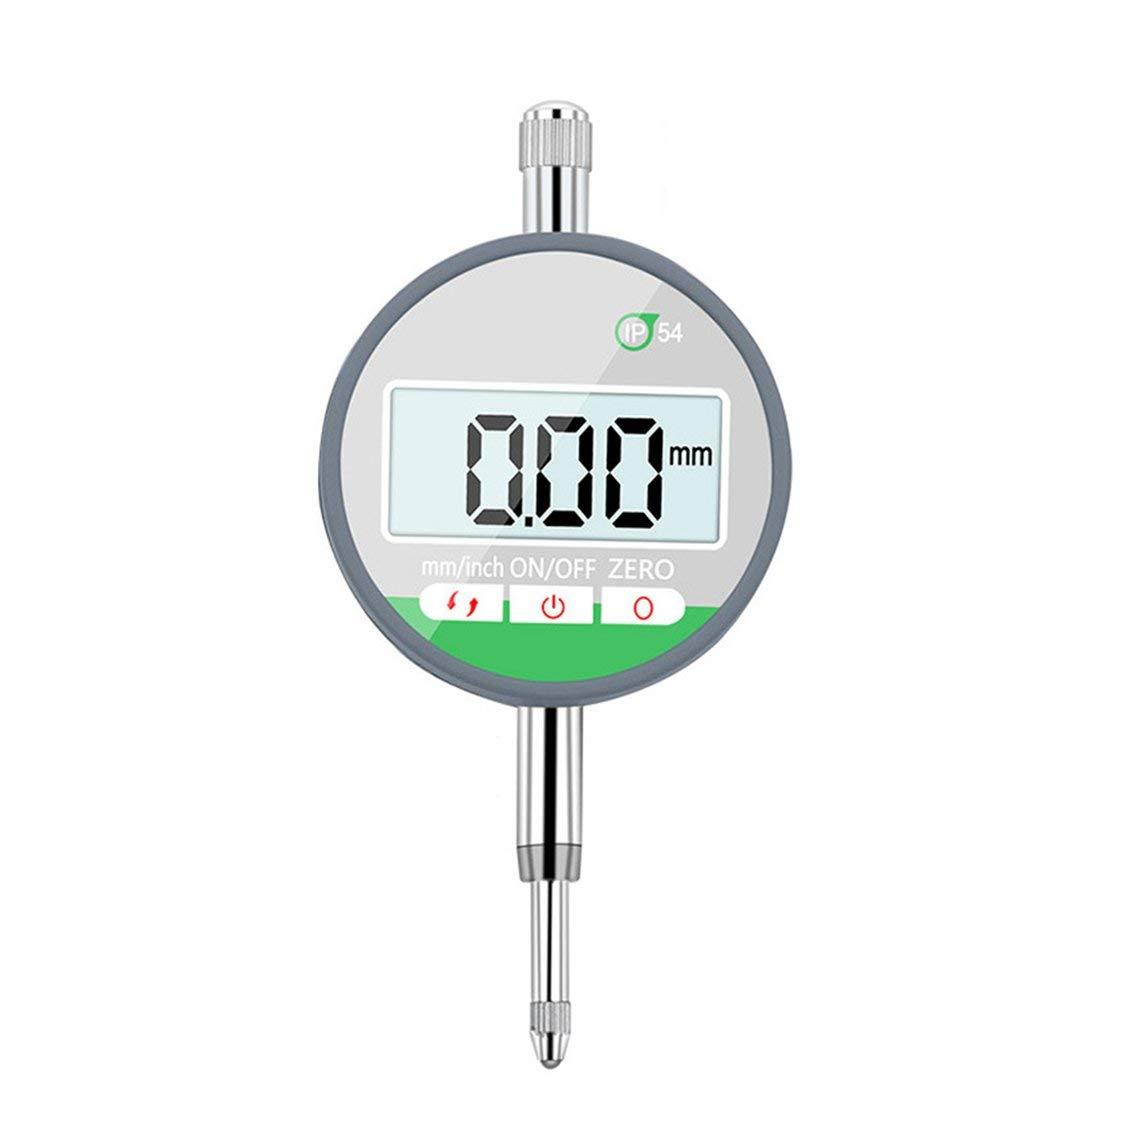 IP54 Electronic Digital Micrometer 0.001mm/0.01mm Dial Indicator Gauge Meter(Silver-Black) Angelshop